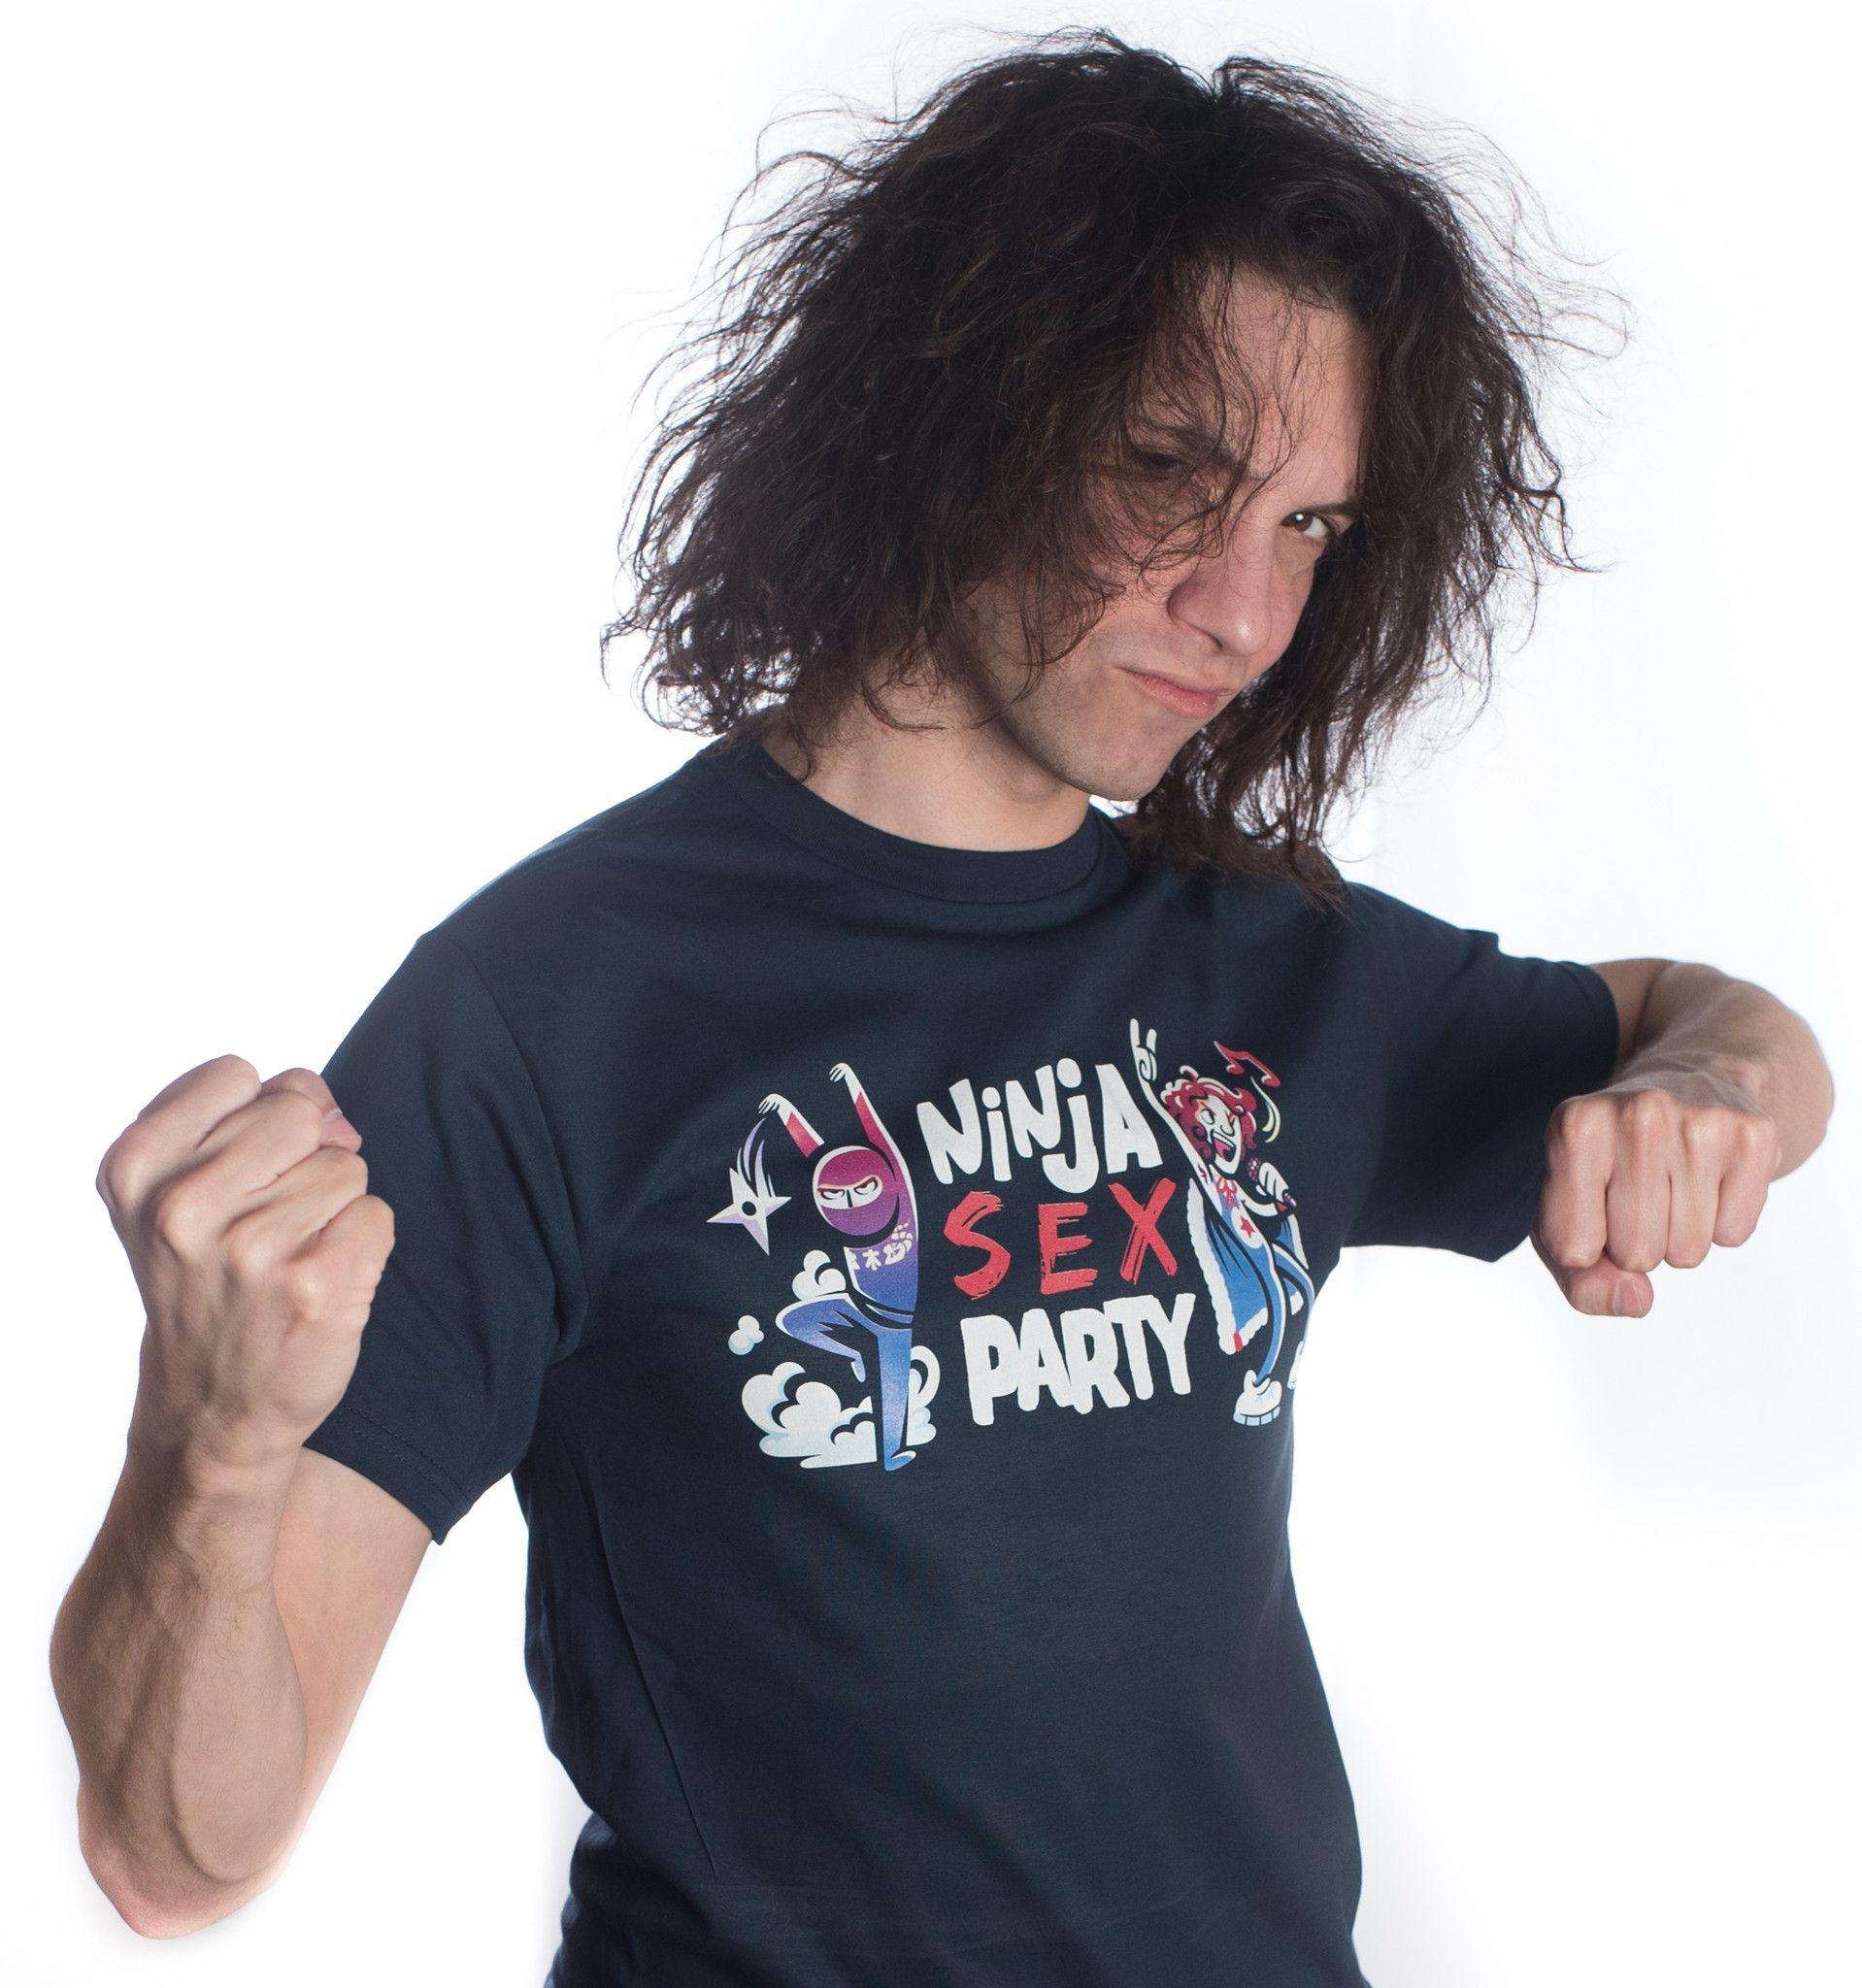 ninja sex party shirts in Sydney